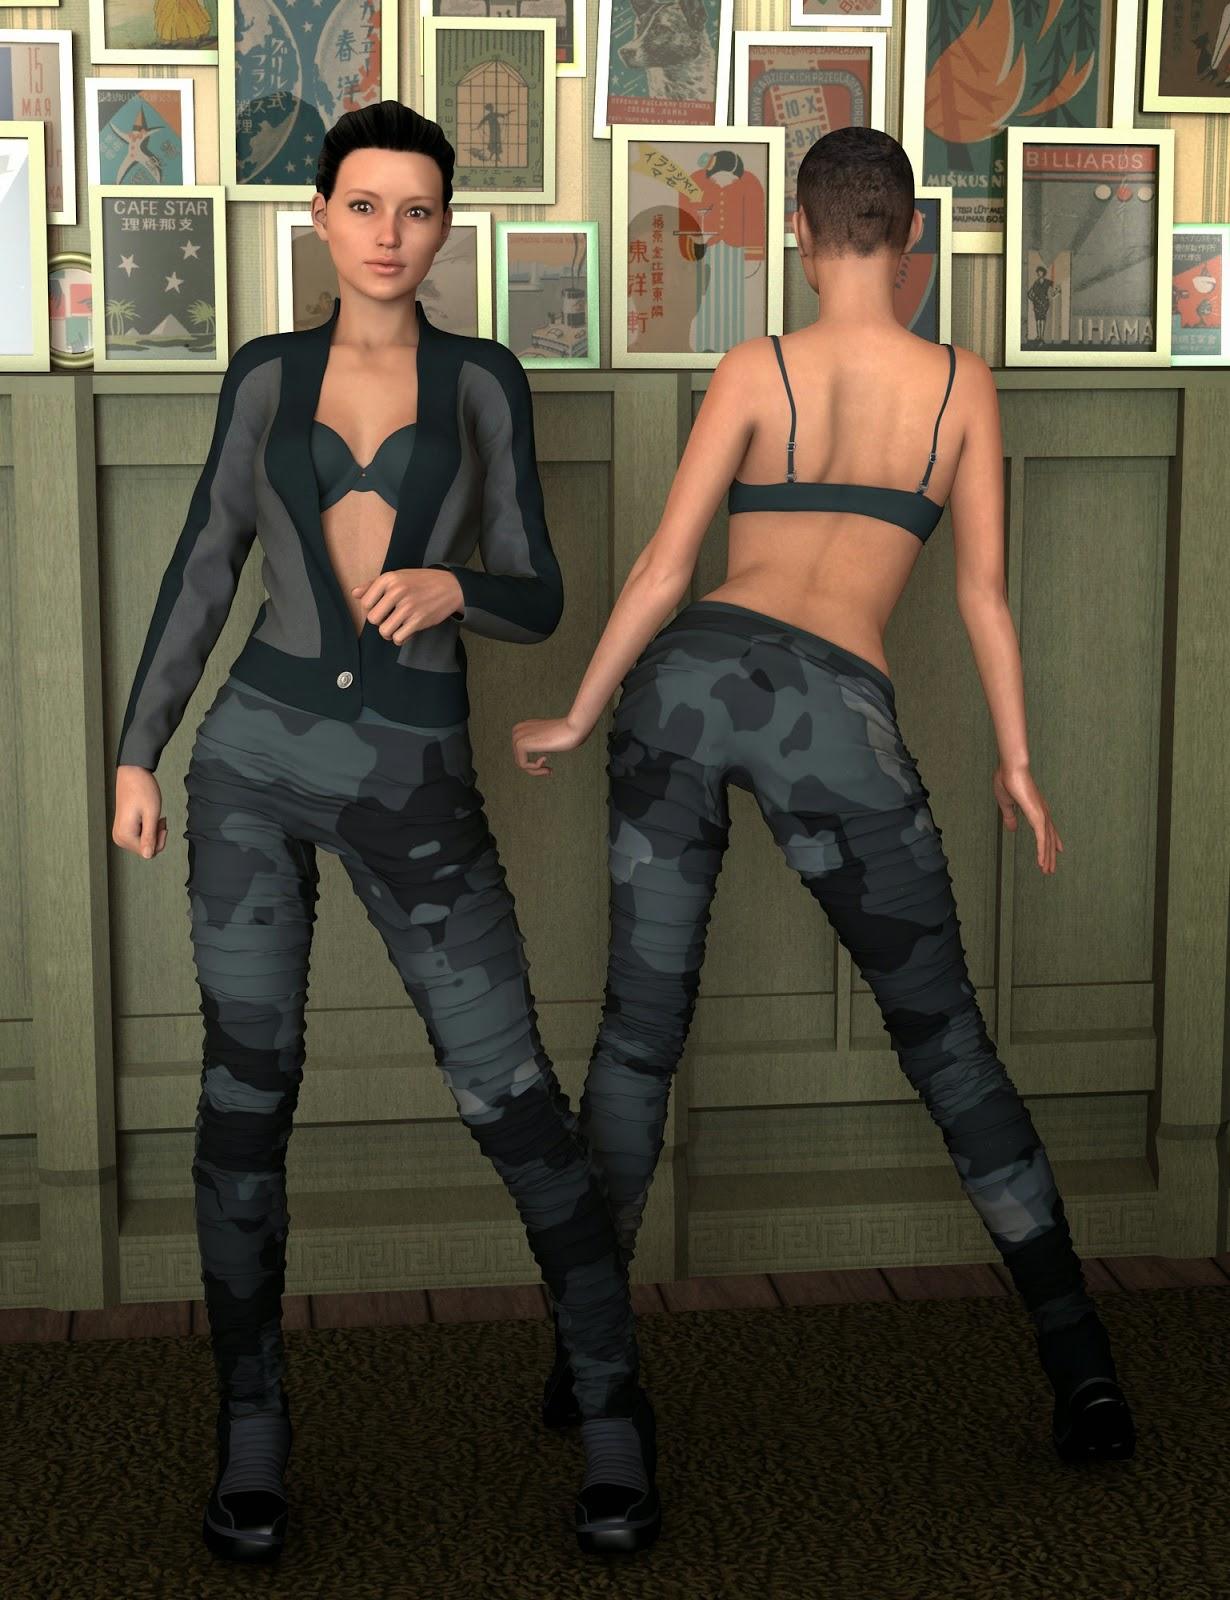 3d Models Art Zone - Army Brat for Genesis 2 Female(s)